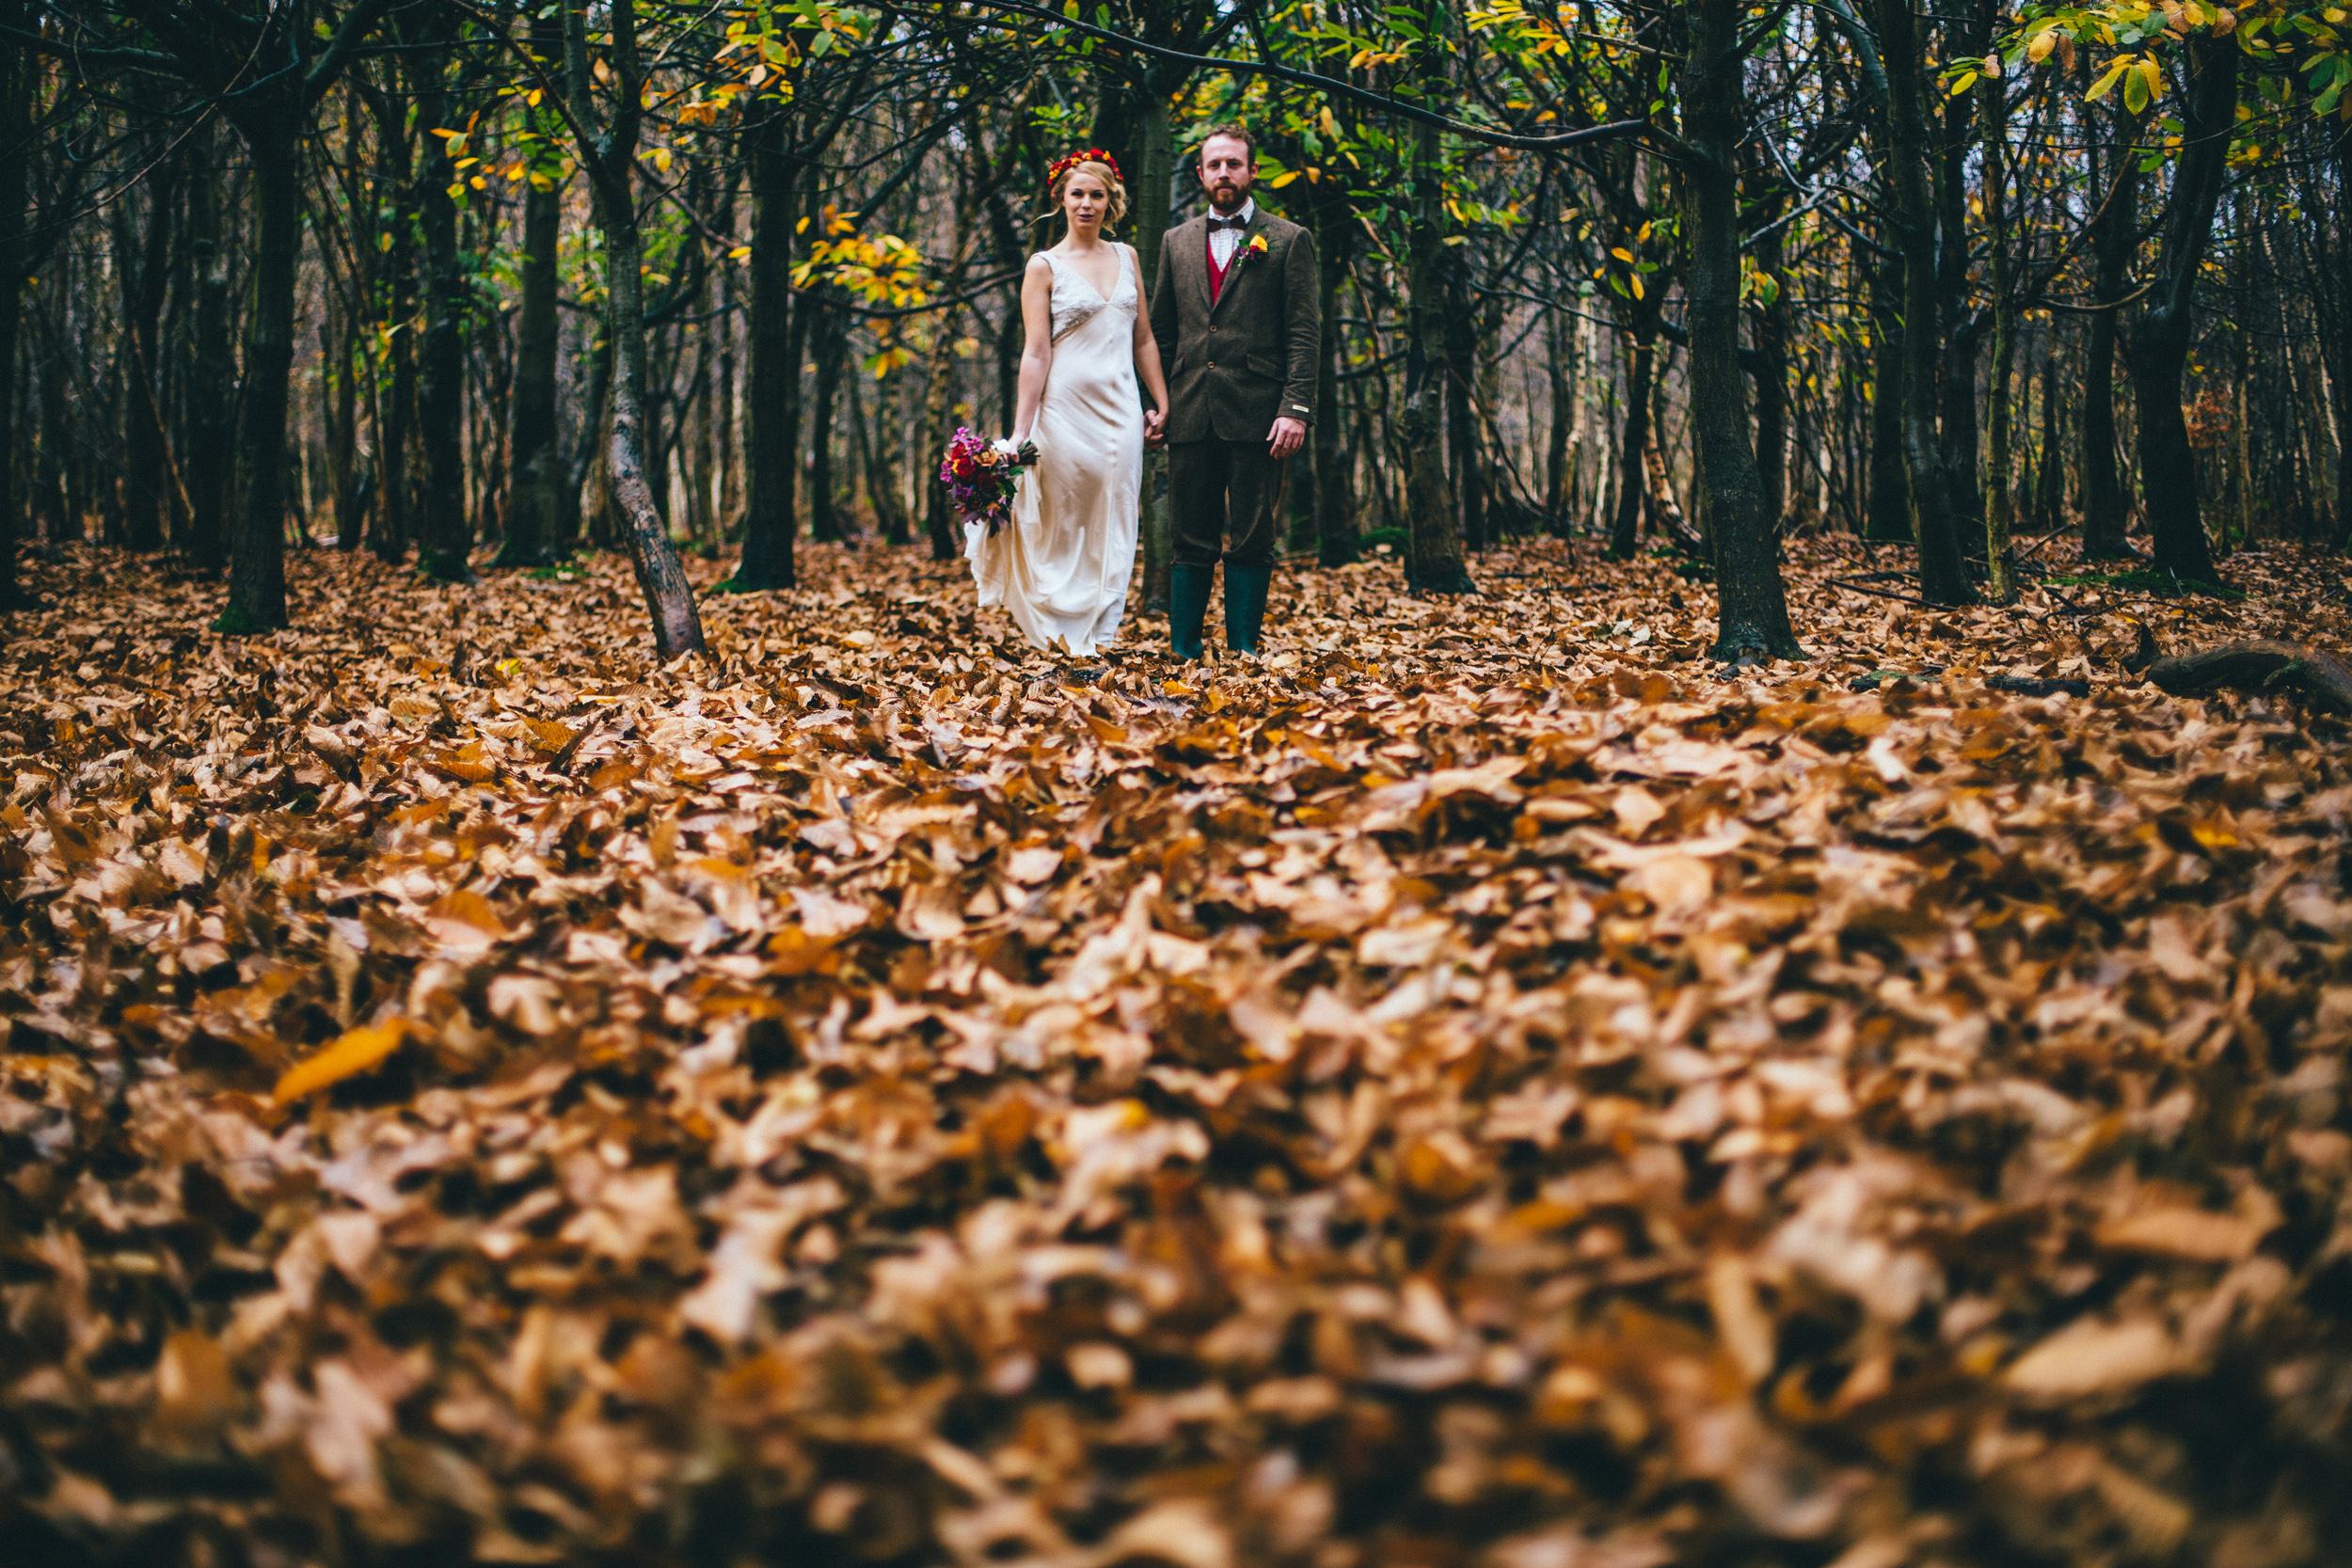 Kate-Beaumont-Wedding-Dresses-Autumn-Shoot-Rebecca-Tovey-9.jpg